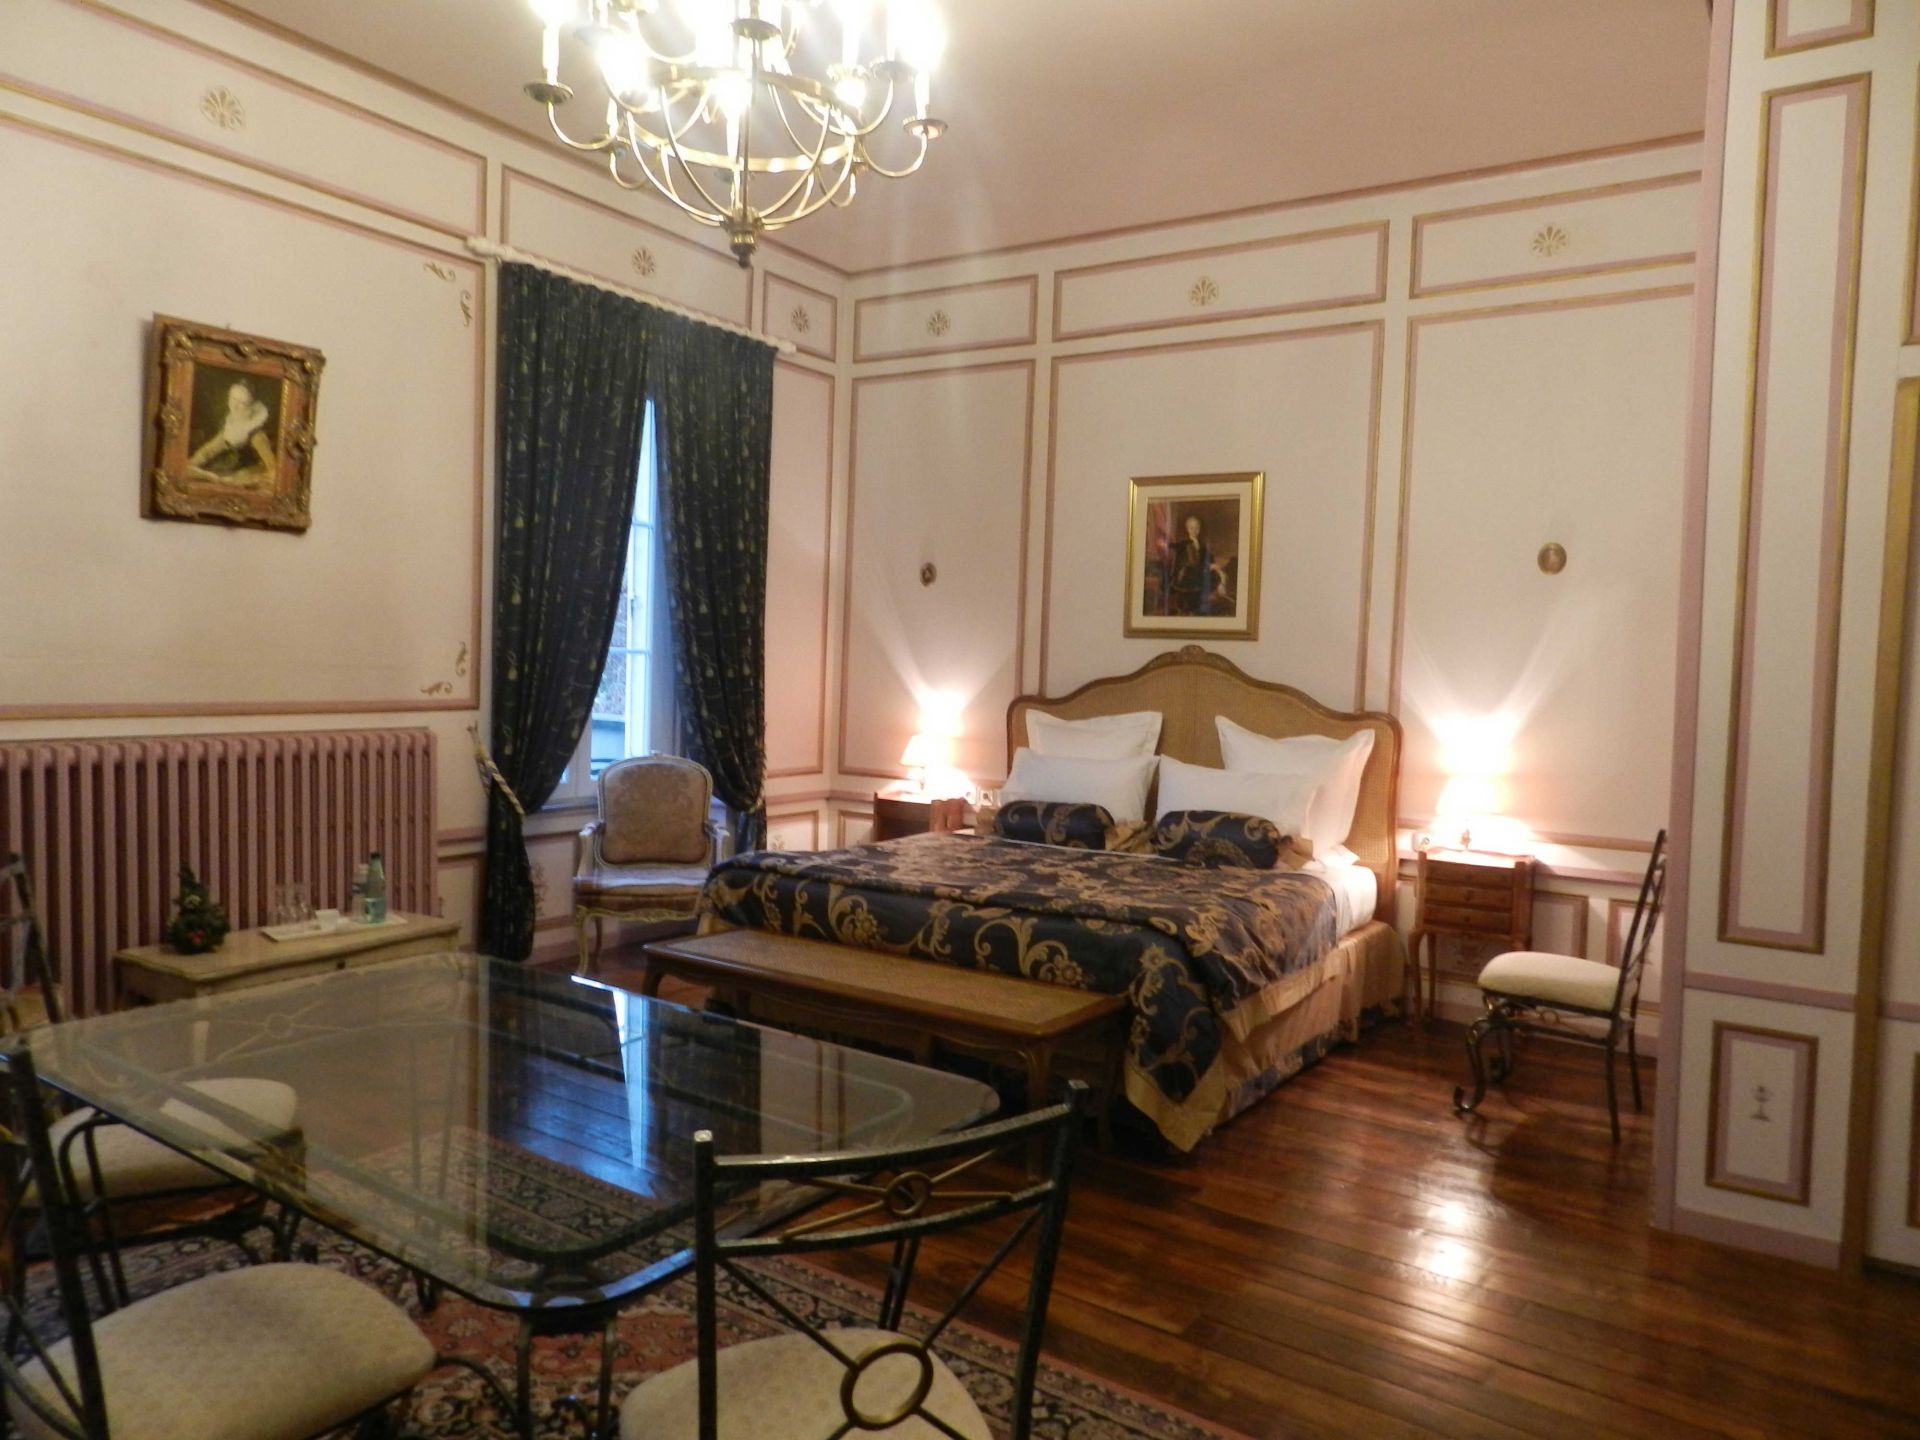 Chambres d 39 hotes chateau de labessiere lorraine tourisme for Chambre hote 93